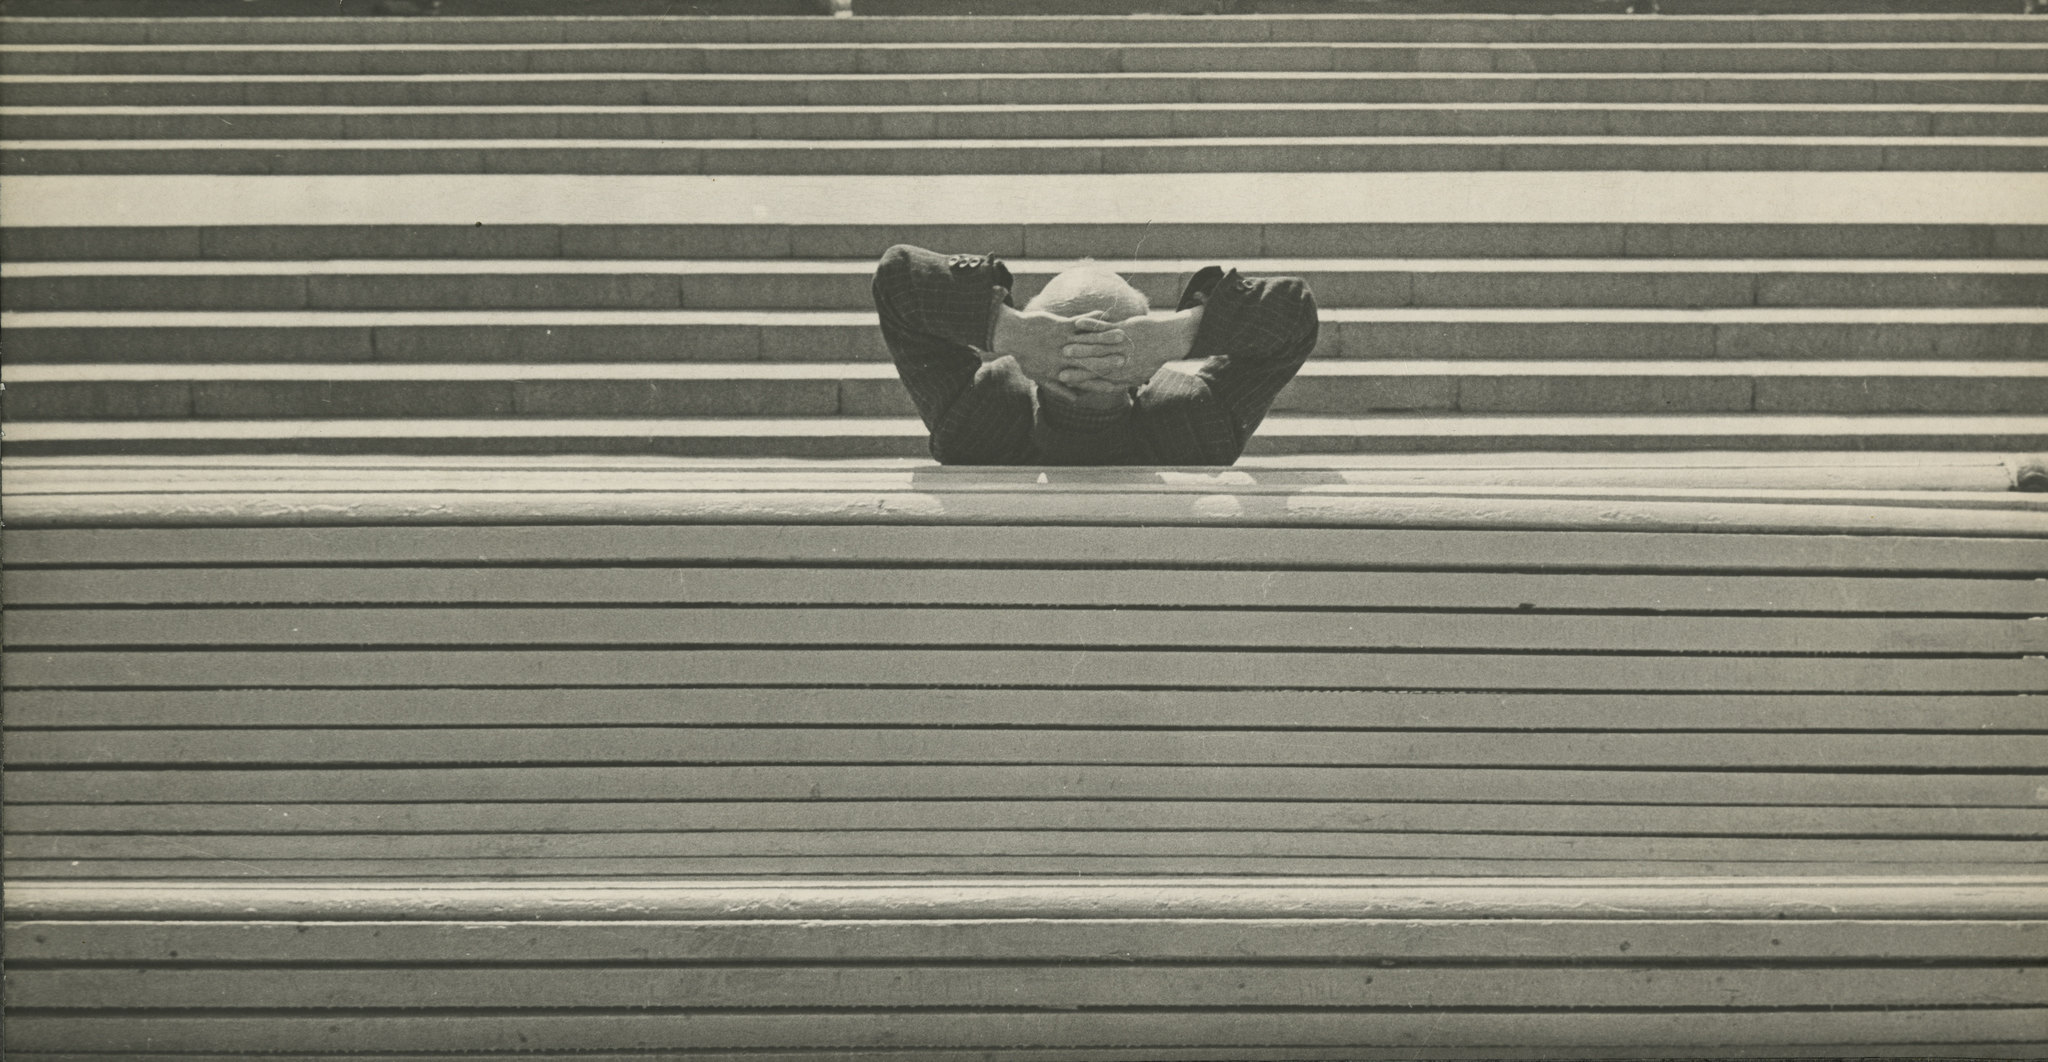 Александр Слюсарев . Скамейка. 1962. Серебряно-желатиновый отпечаток.